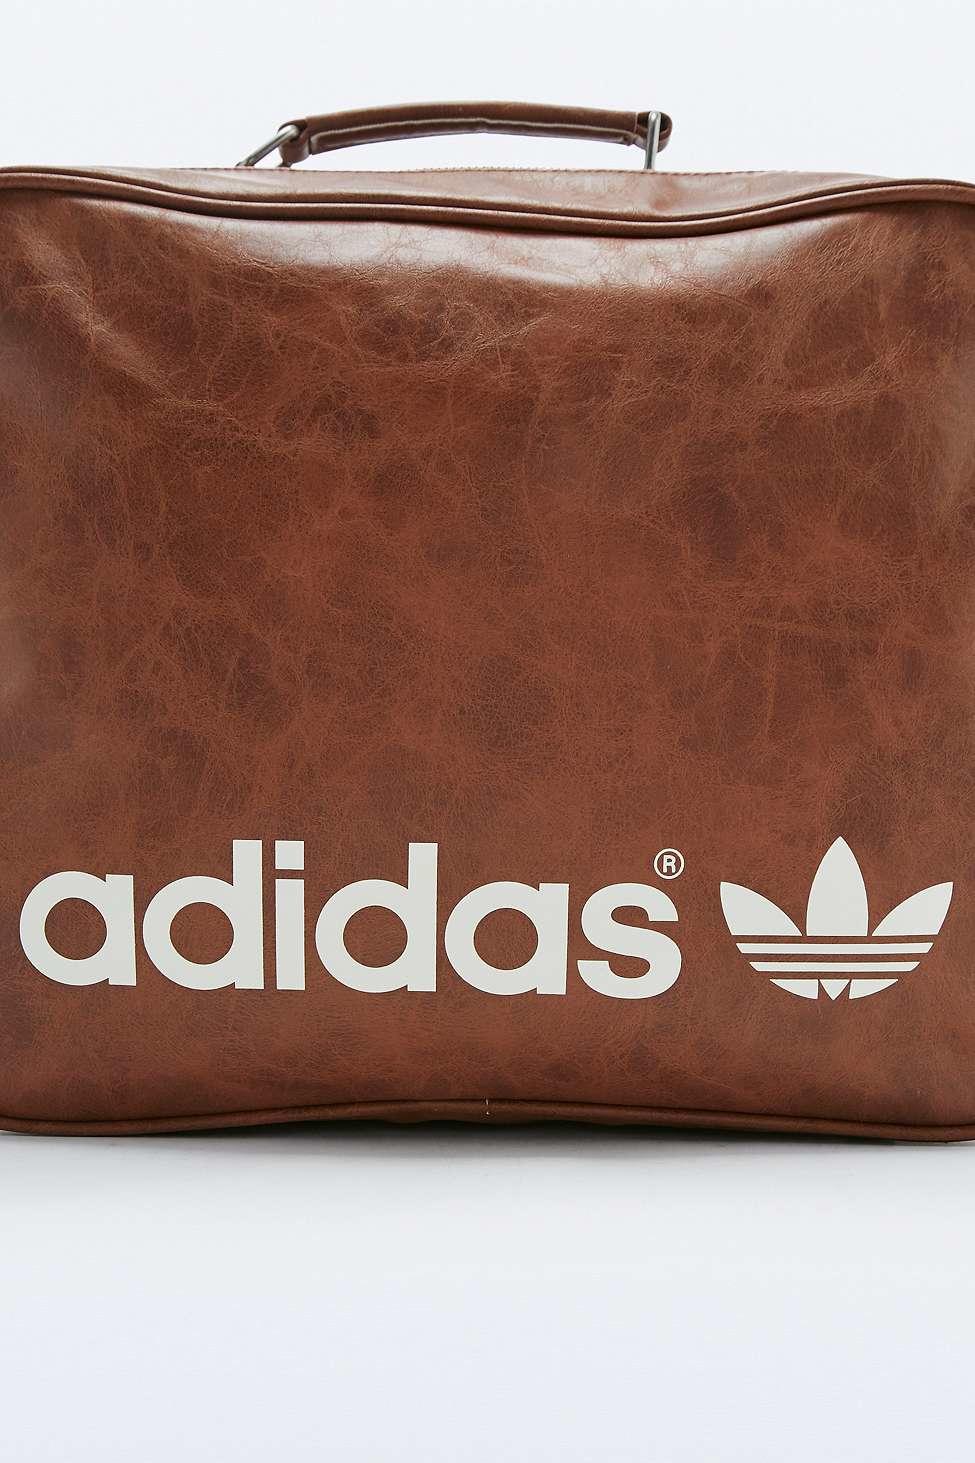 5c97676c44 adidas Originals Brown Vintage Airline Bag in Brown for Men - Lyst